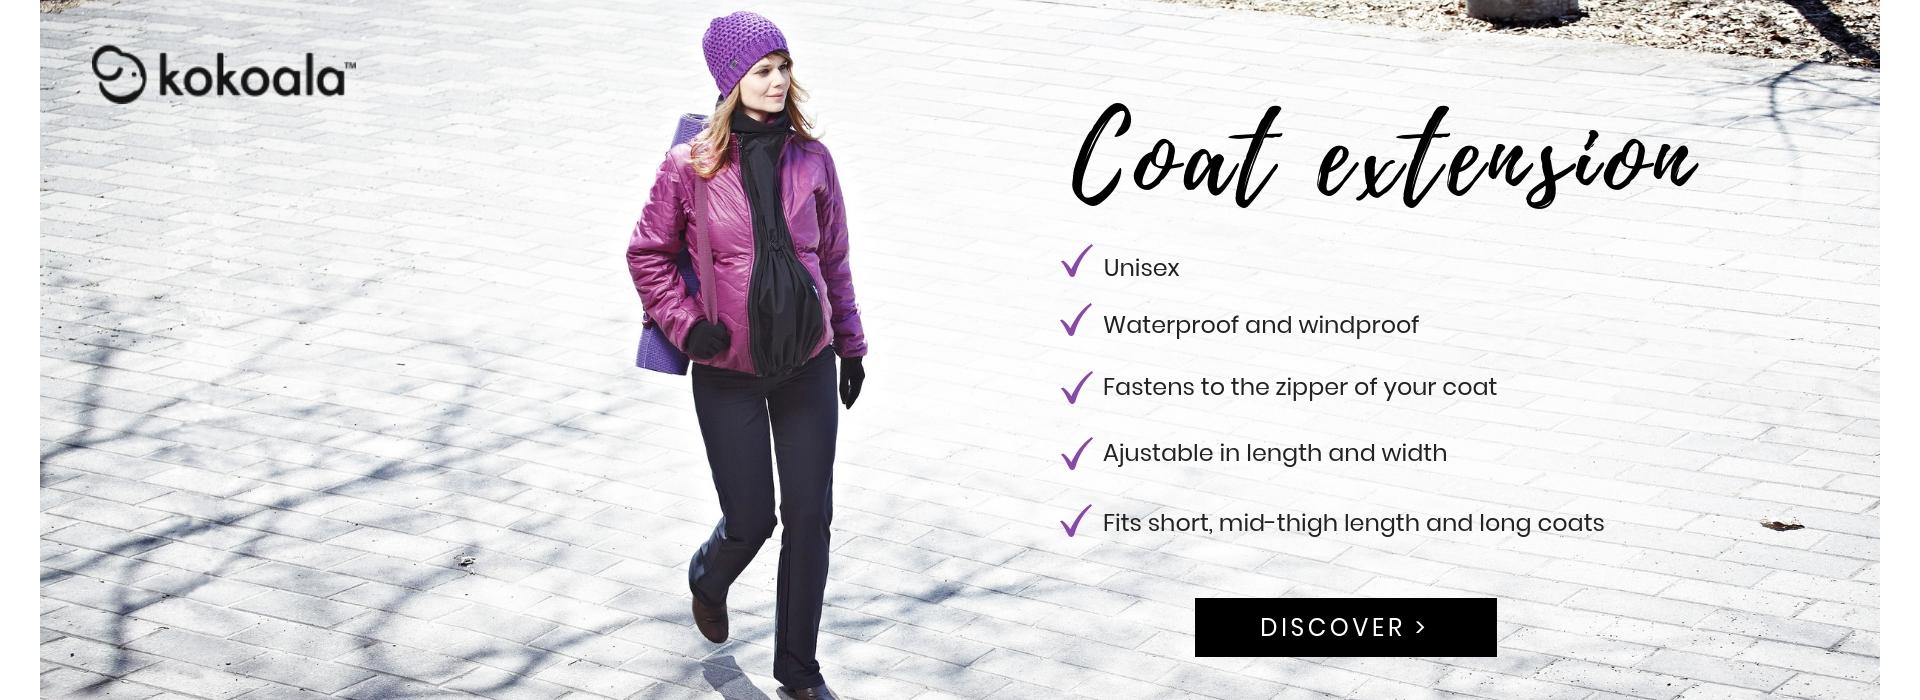 kokoala winter coat extention